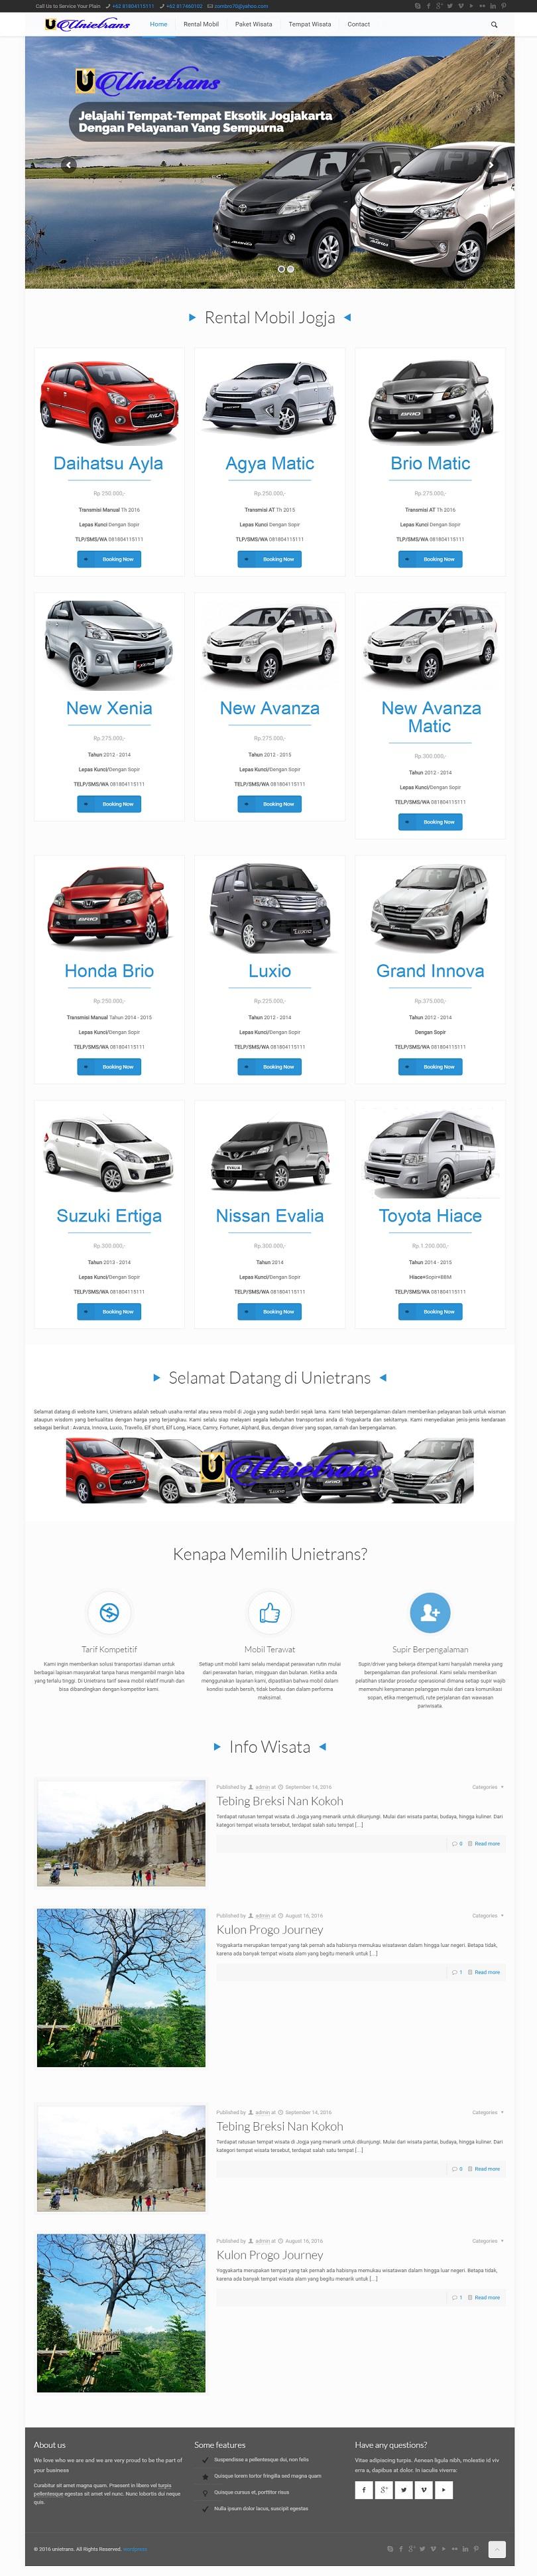 jasa-pembuatan-website-untuk-rental-sewa-mobil-unietrans